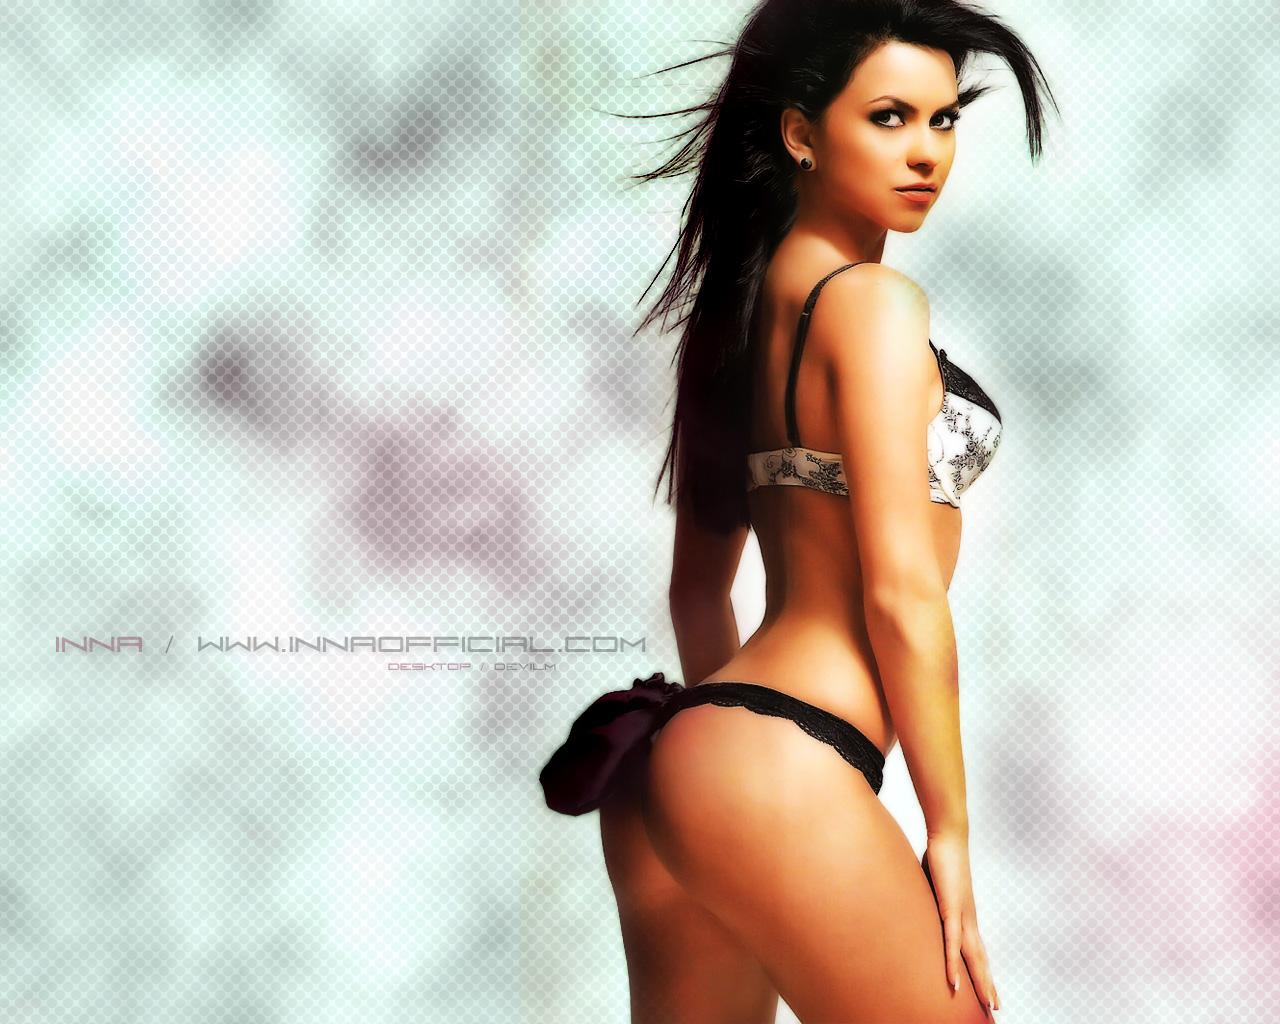 http://3.bp.blogspot.com/-JiD0NR32yRs/ULjOblF1HPI/AAAAAAAAS04/LTa0swueQoI/s1600/inna-hot-inna+(12).jpg